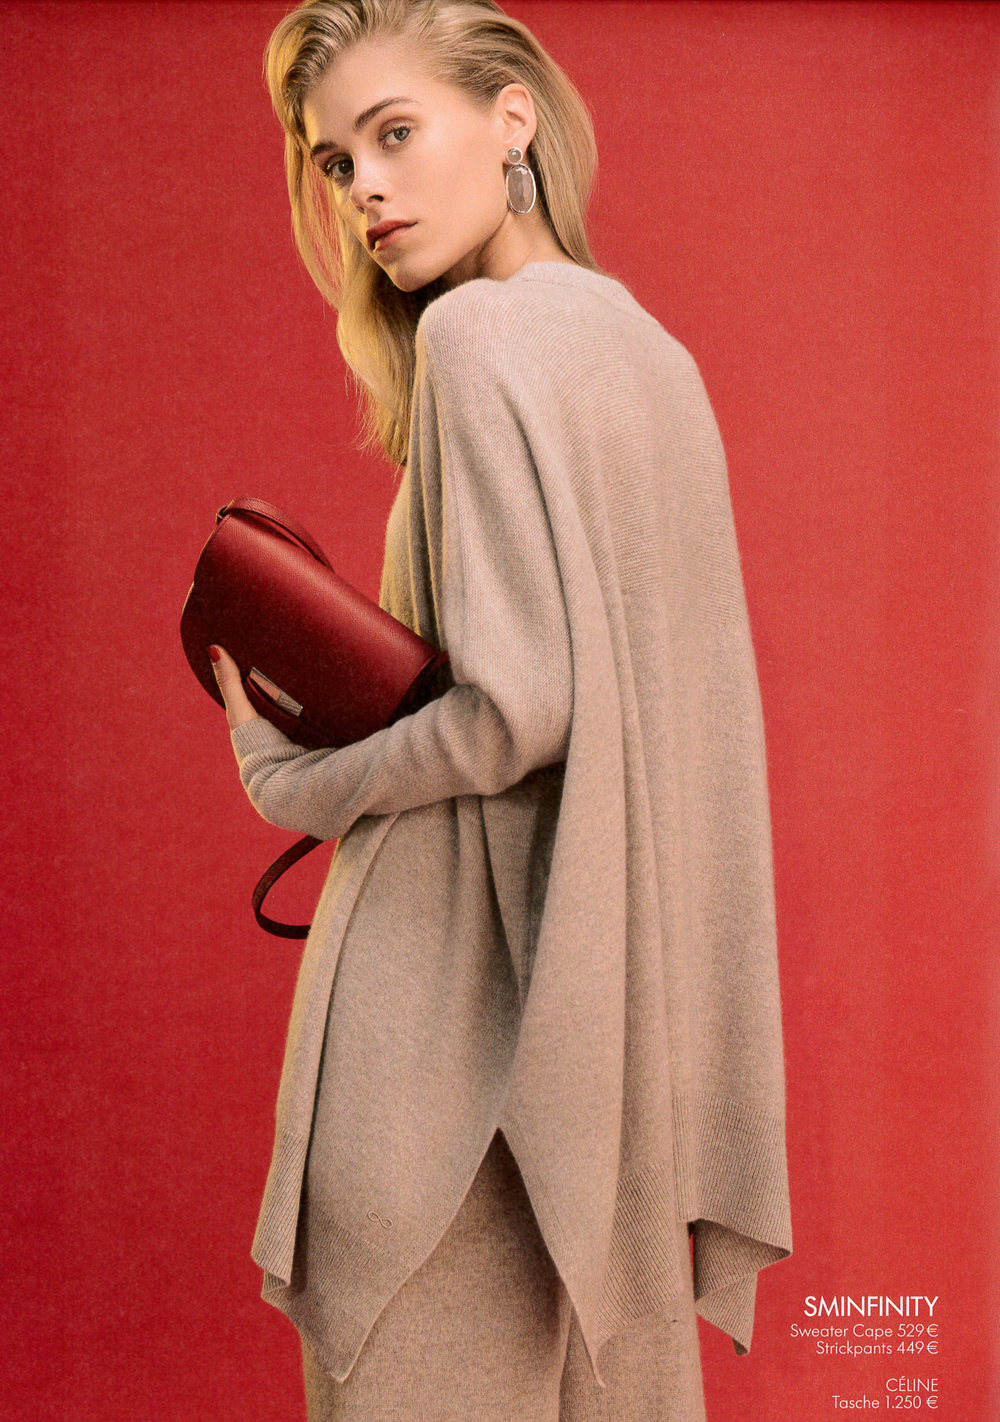 APROPOS, SMINFINITY Sweater Cape, Strickpants, CÉLINE Tasche